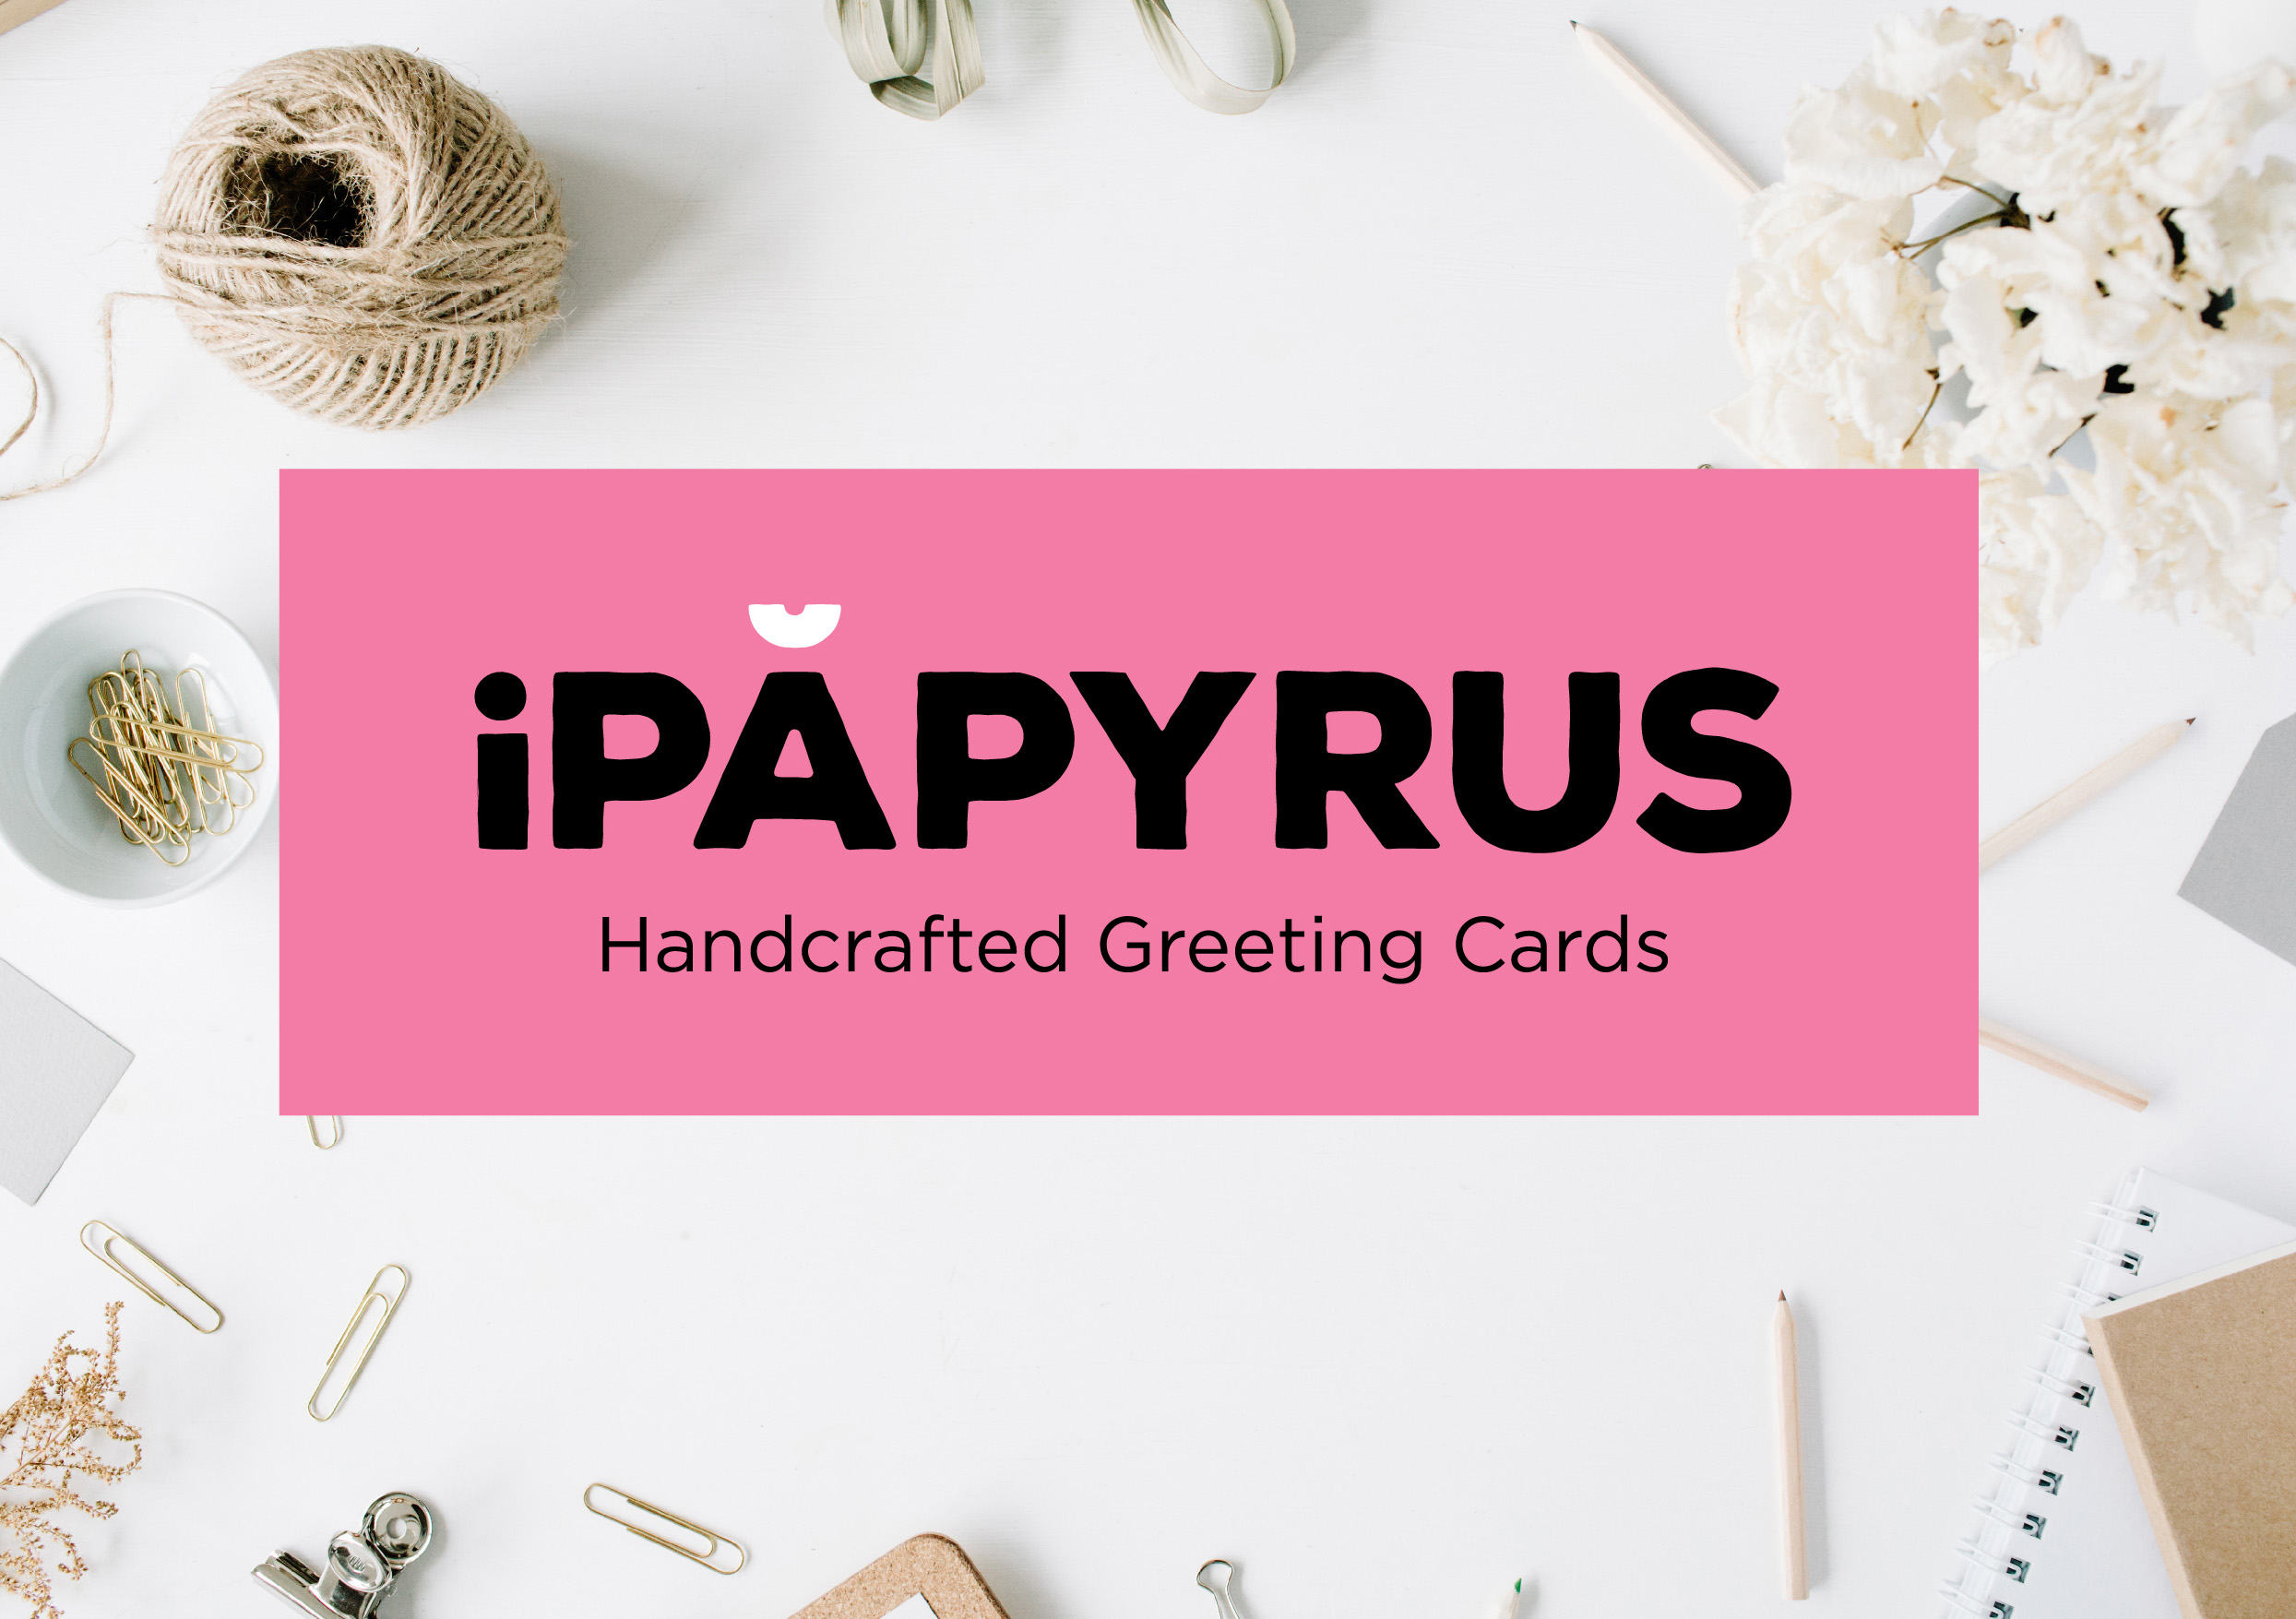 ipapyrus logo 5-100.jpg